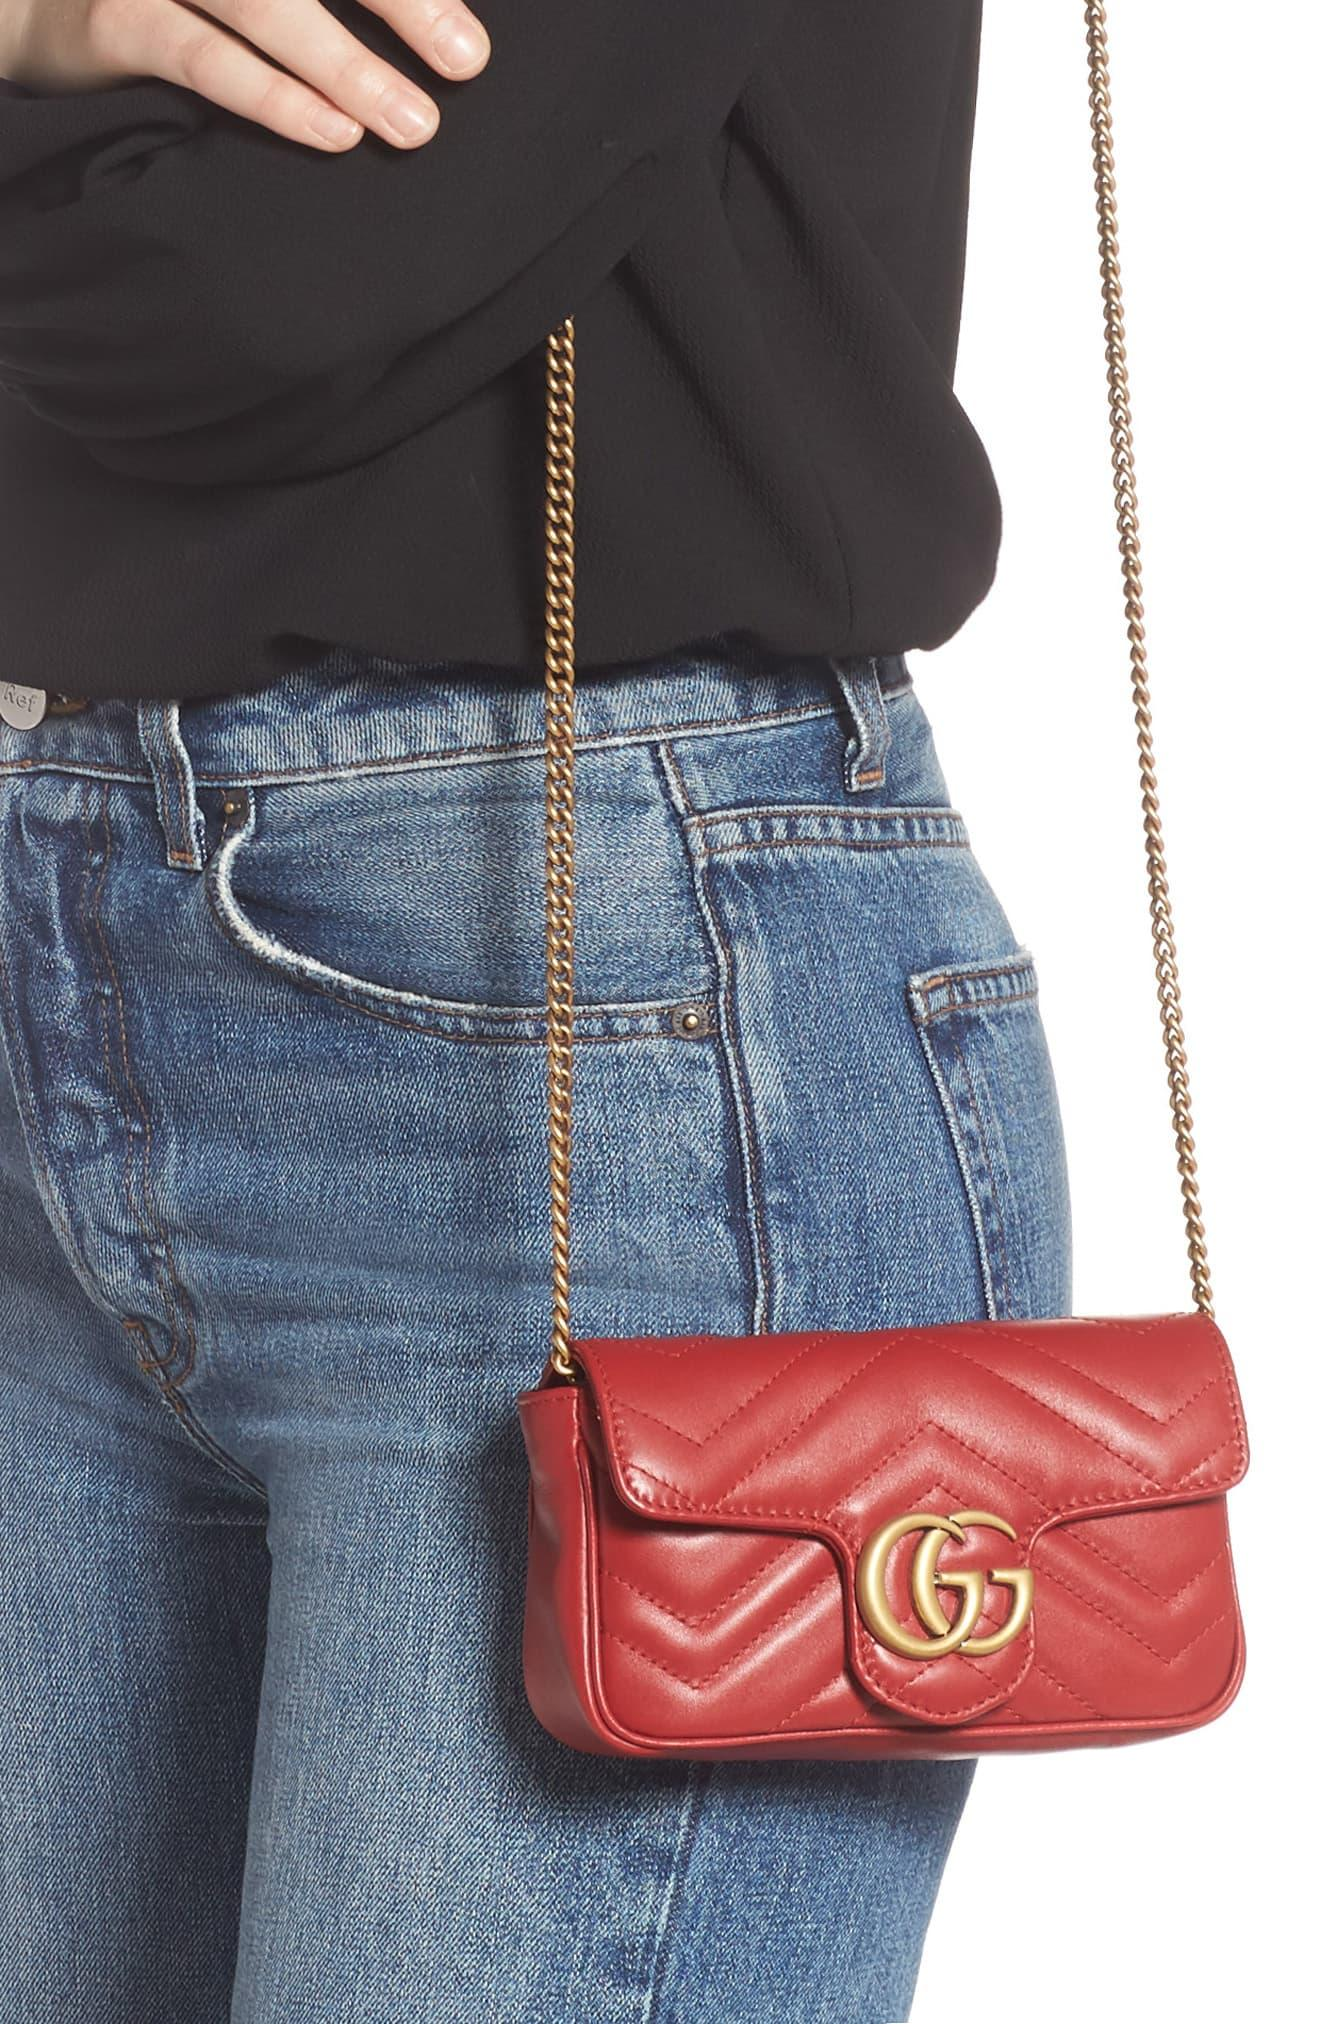 29e951be0 ... Gucci Red Mini Borsa Gg Marmont In Pelle Matelassé · Visit Nordstrom.  Tap to visit site